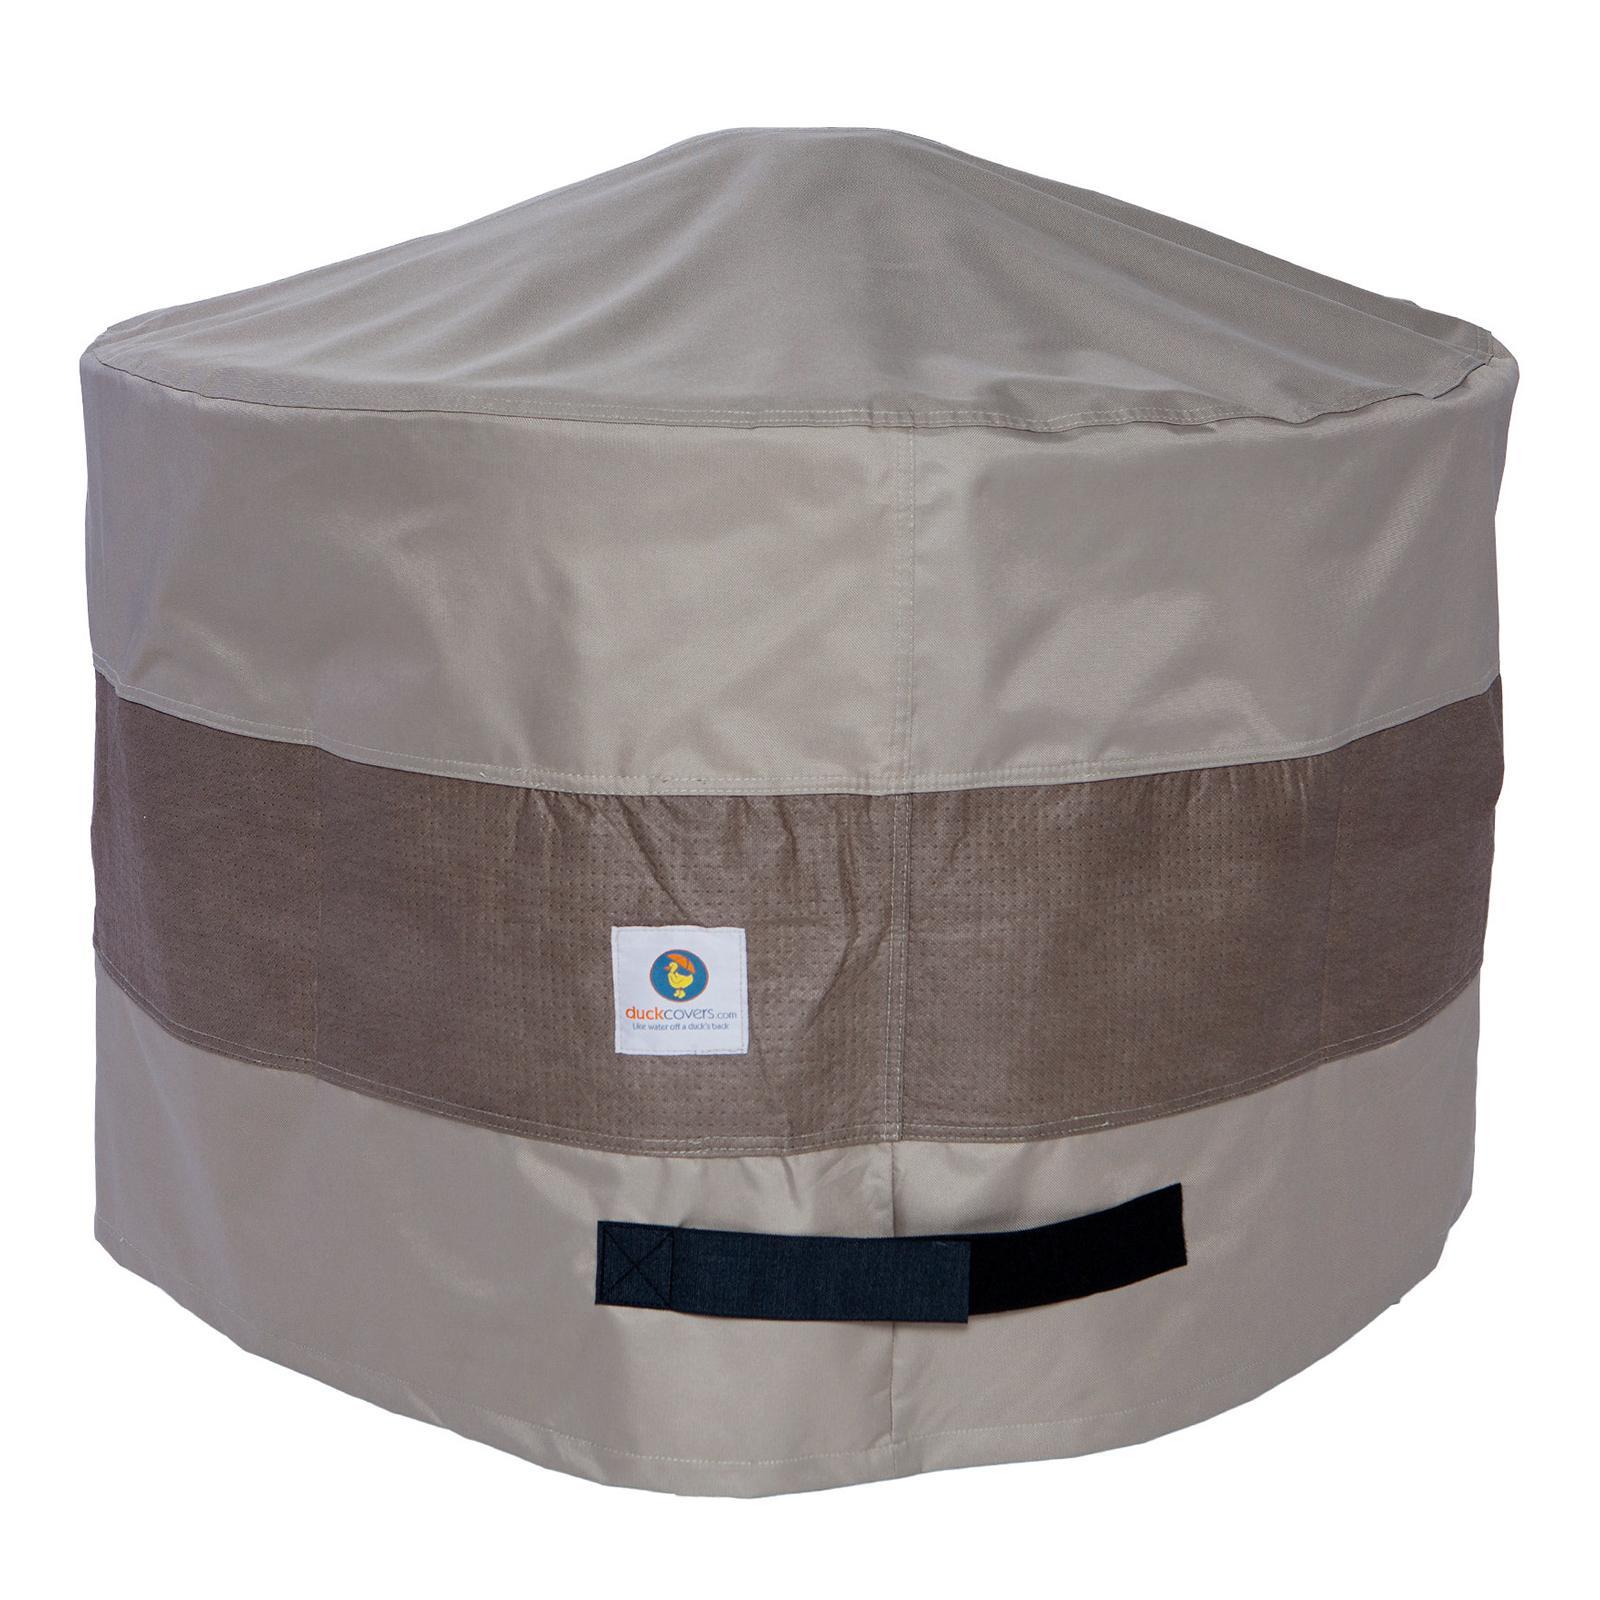 Amazon Com Duck Covers Elegant Patio Umbrella Cover With